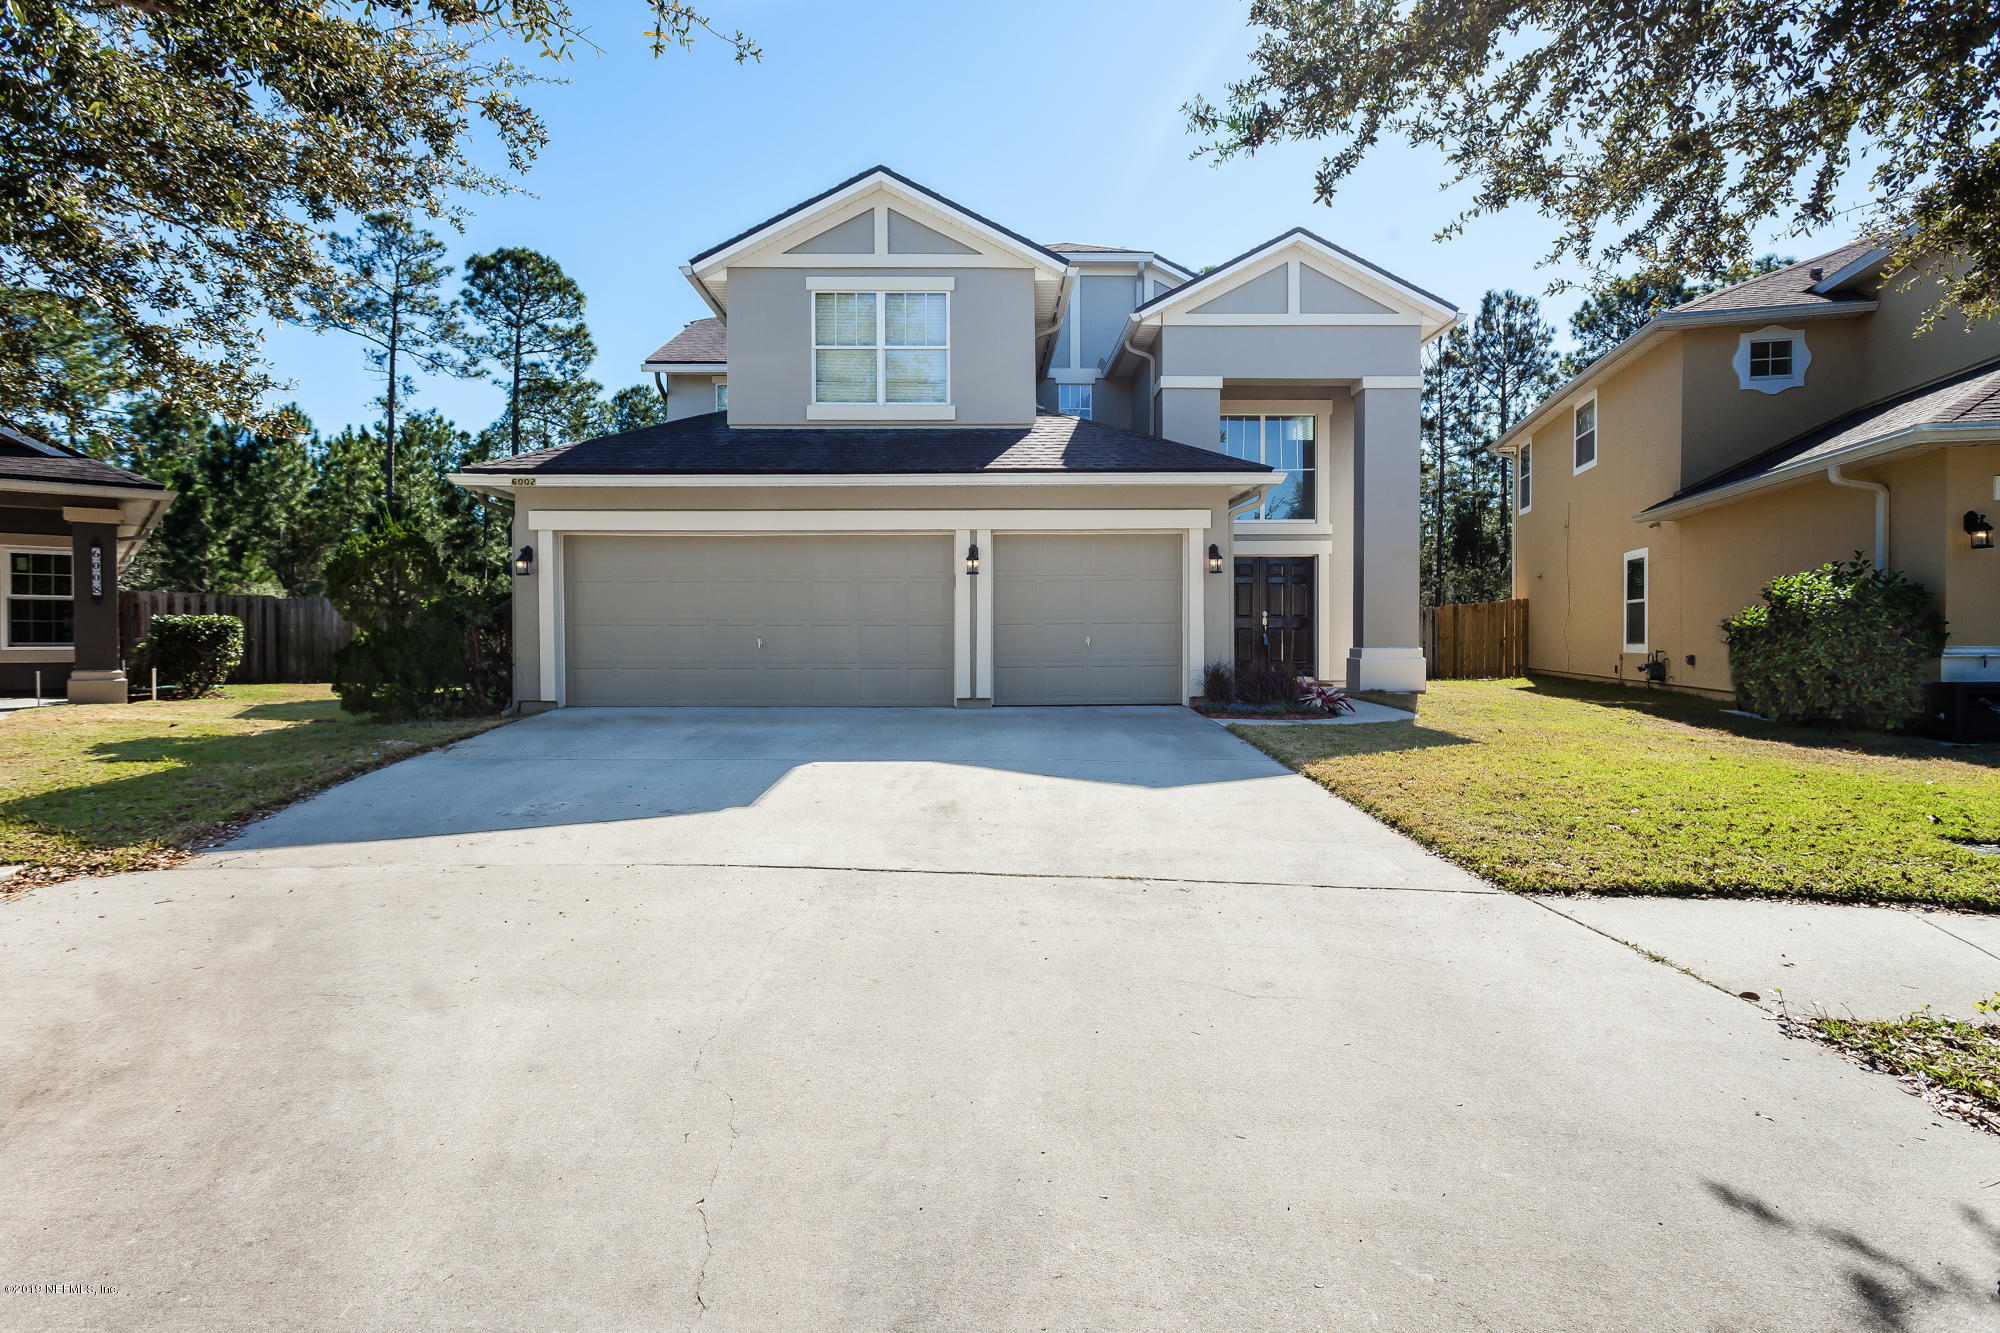 Photo of 6002 WIND CAVE, JACKSONVILLE, FL 32258